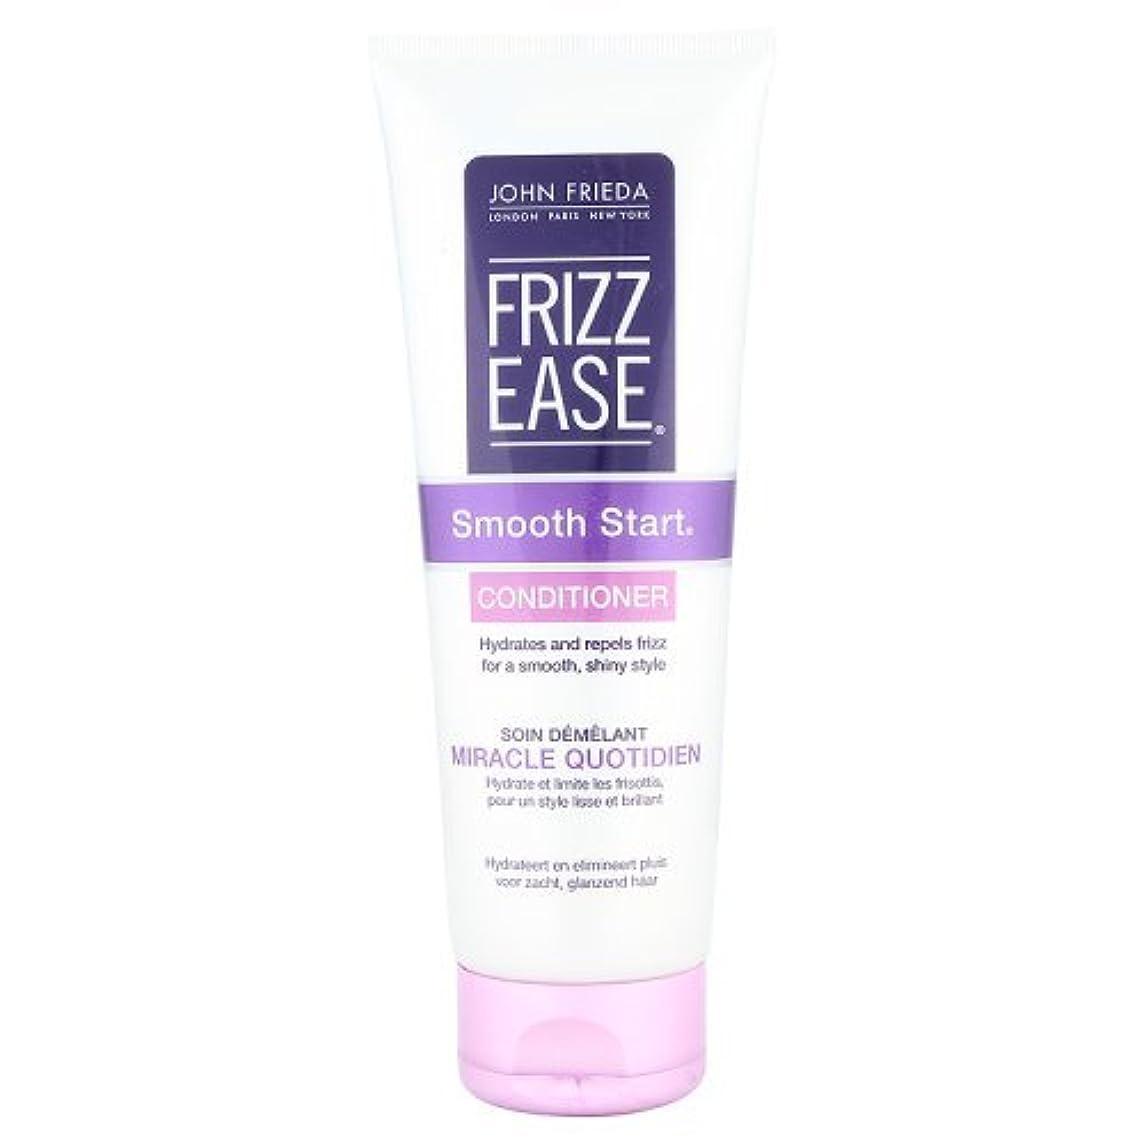 John Frieda Frizz-Ease Smooth Start Conditioner 250ml